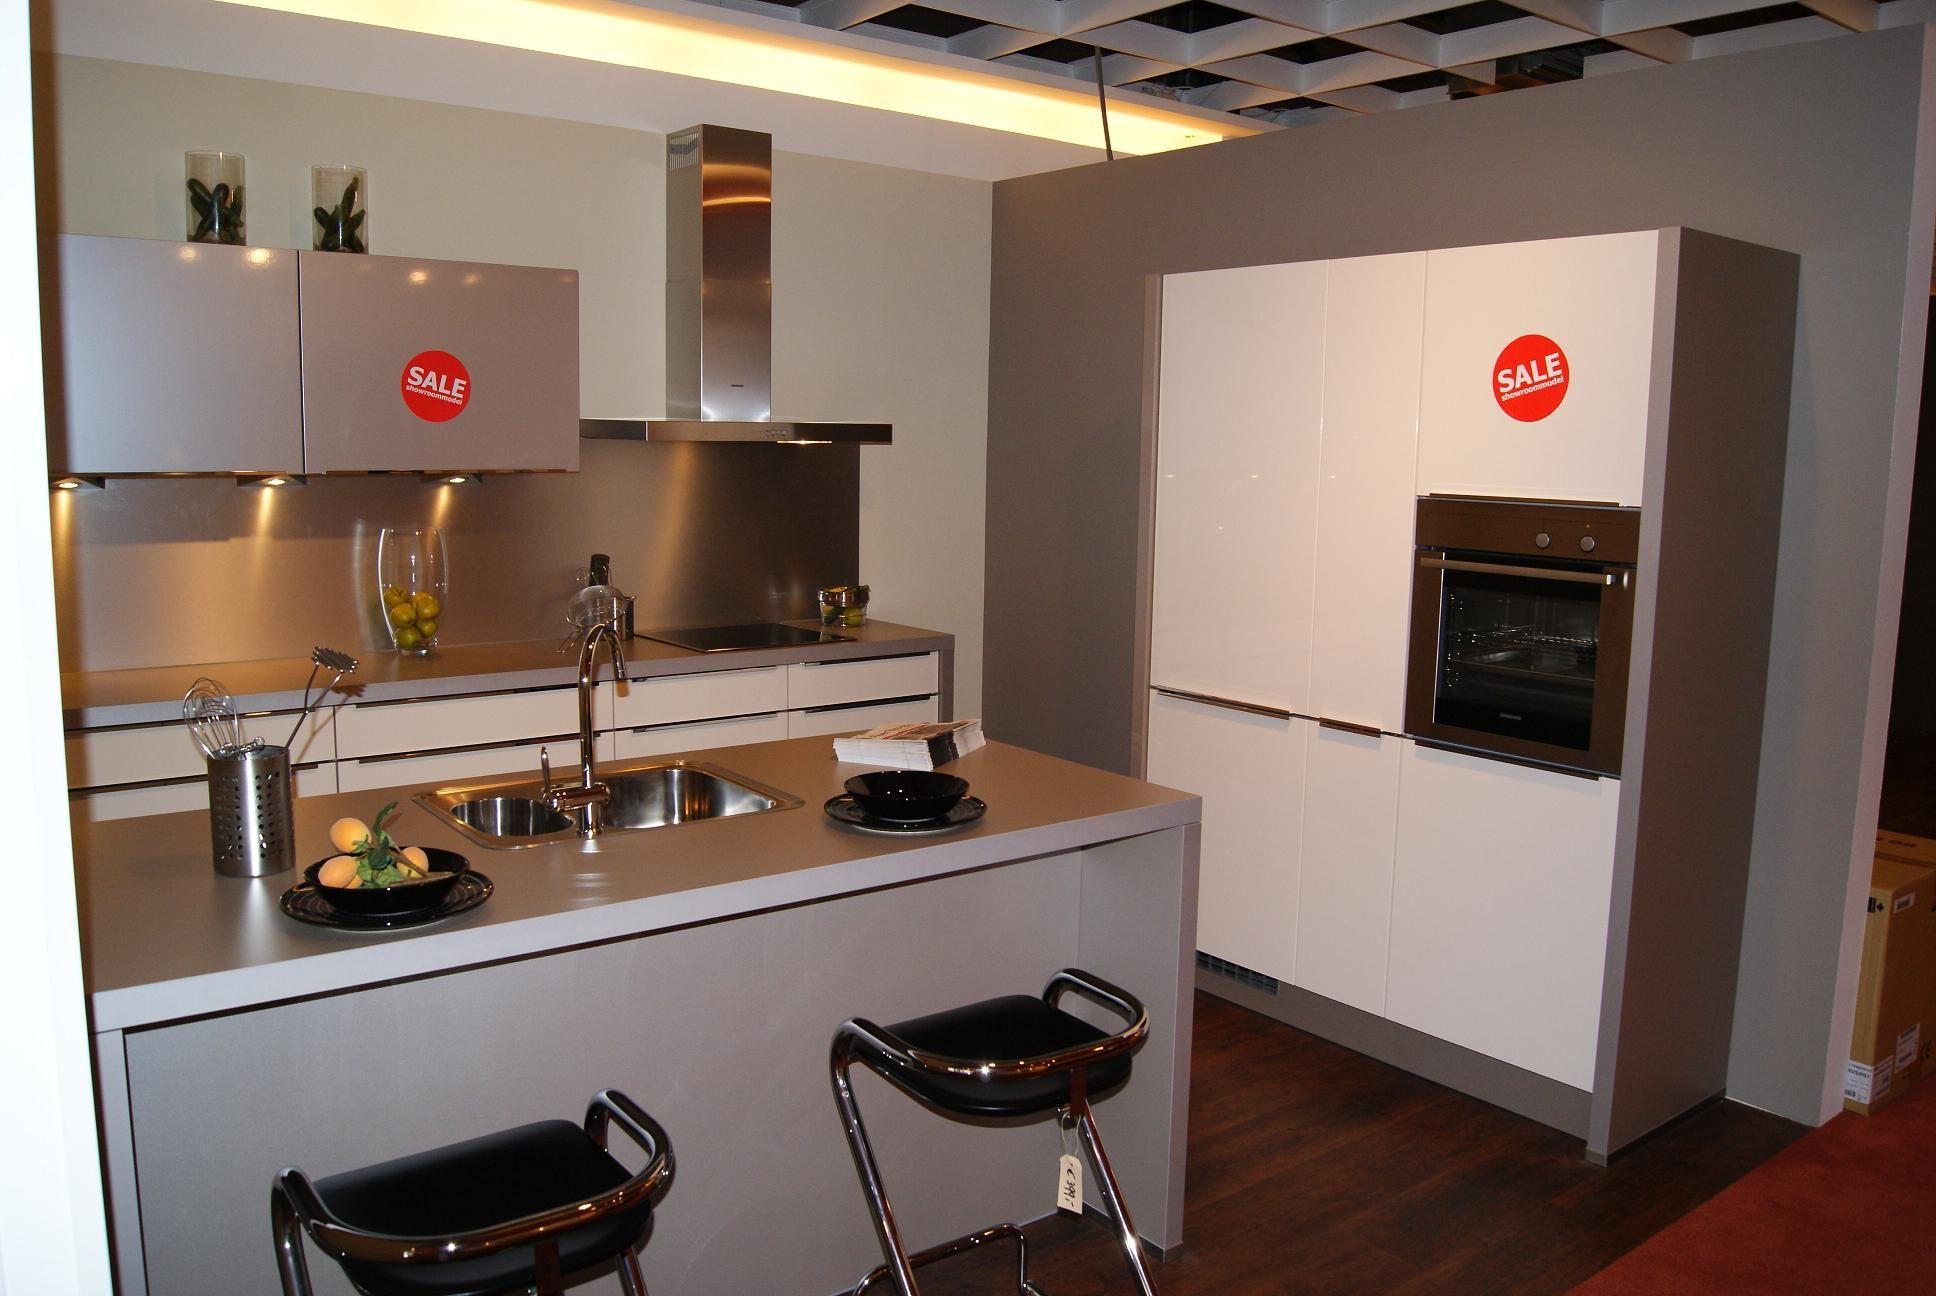 Keuken met spoeleiland tegel - Keuken centraal eiland ...